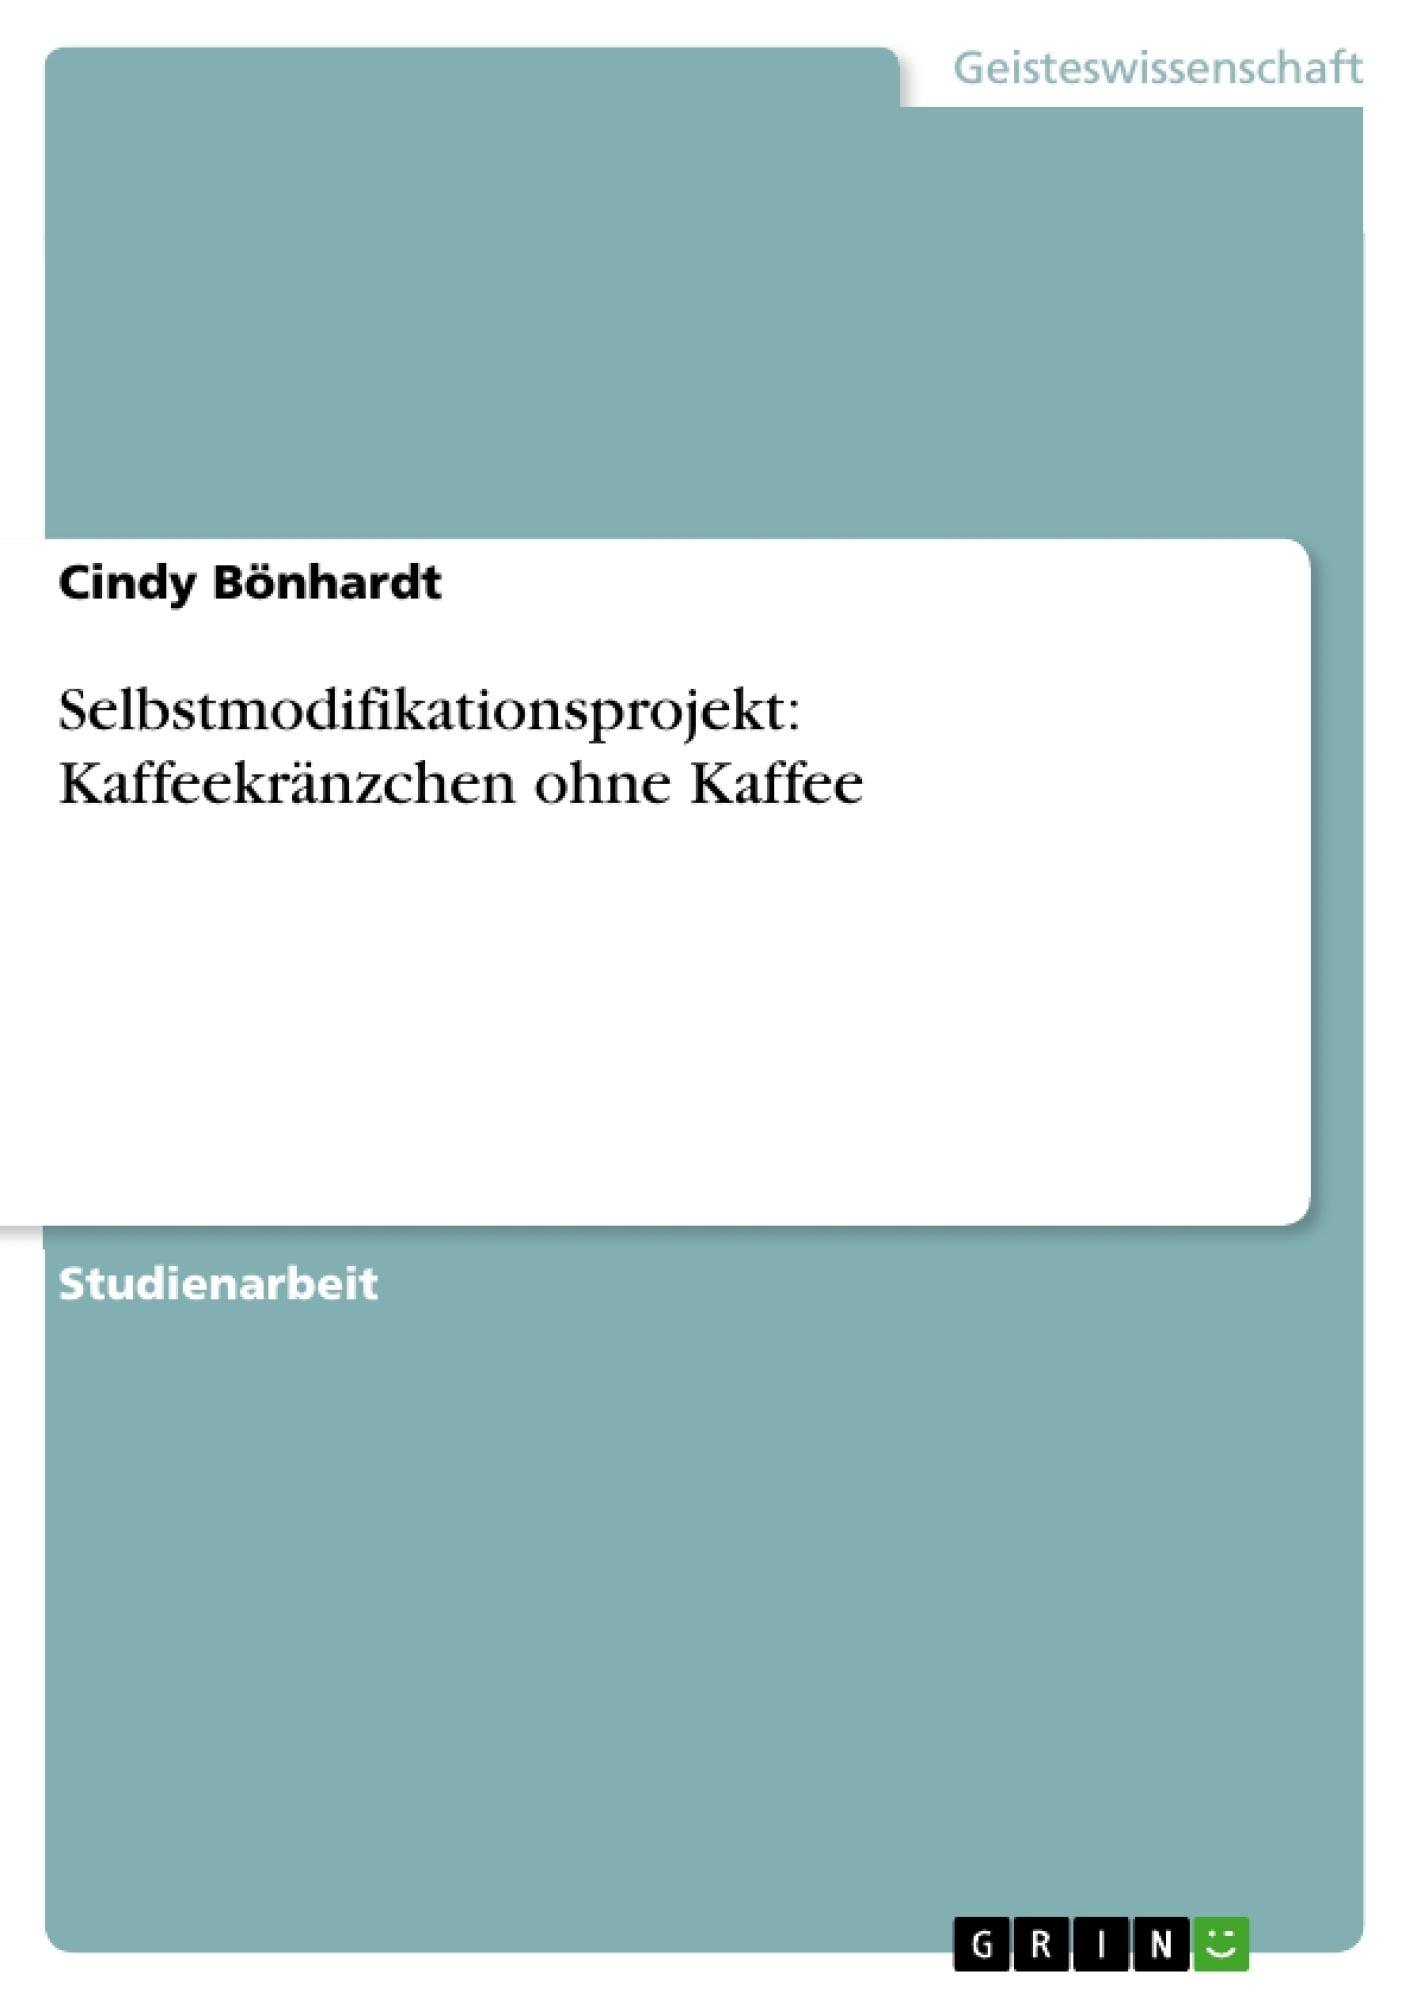 Titel: Selbstmodifikationsprojekt: Kaffeekränzchen ohne Kaffee